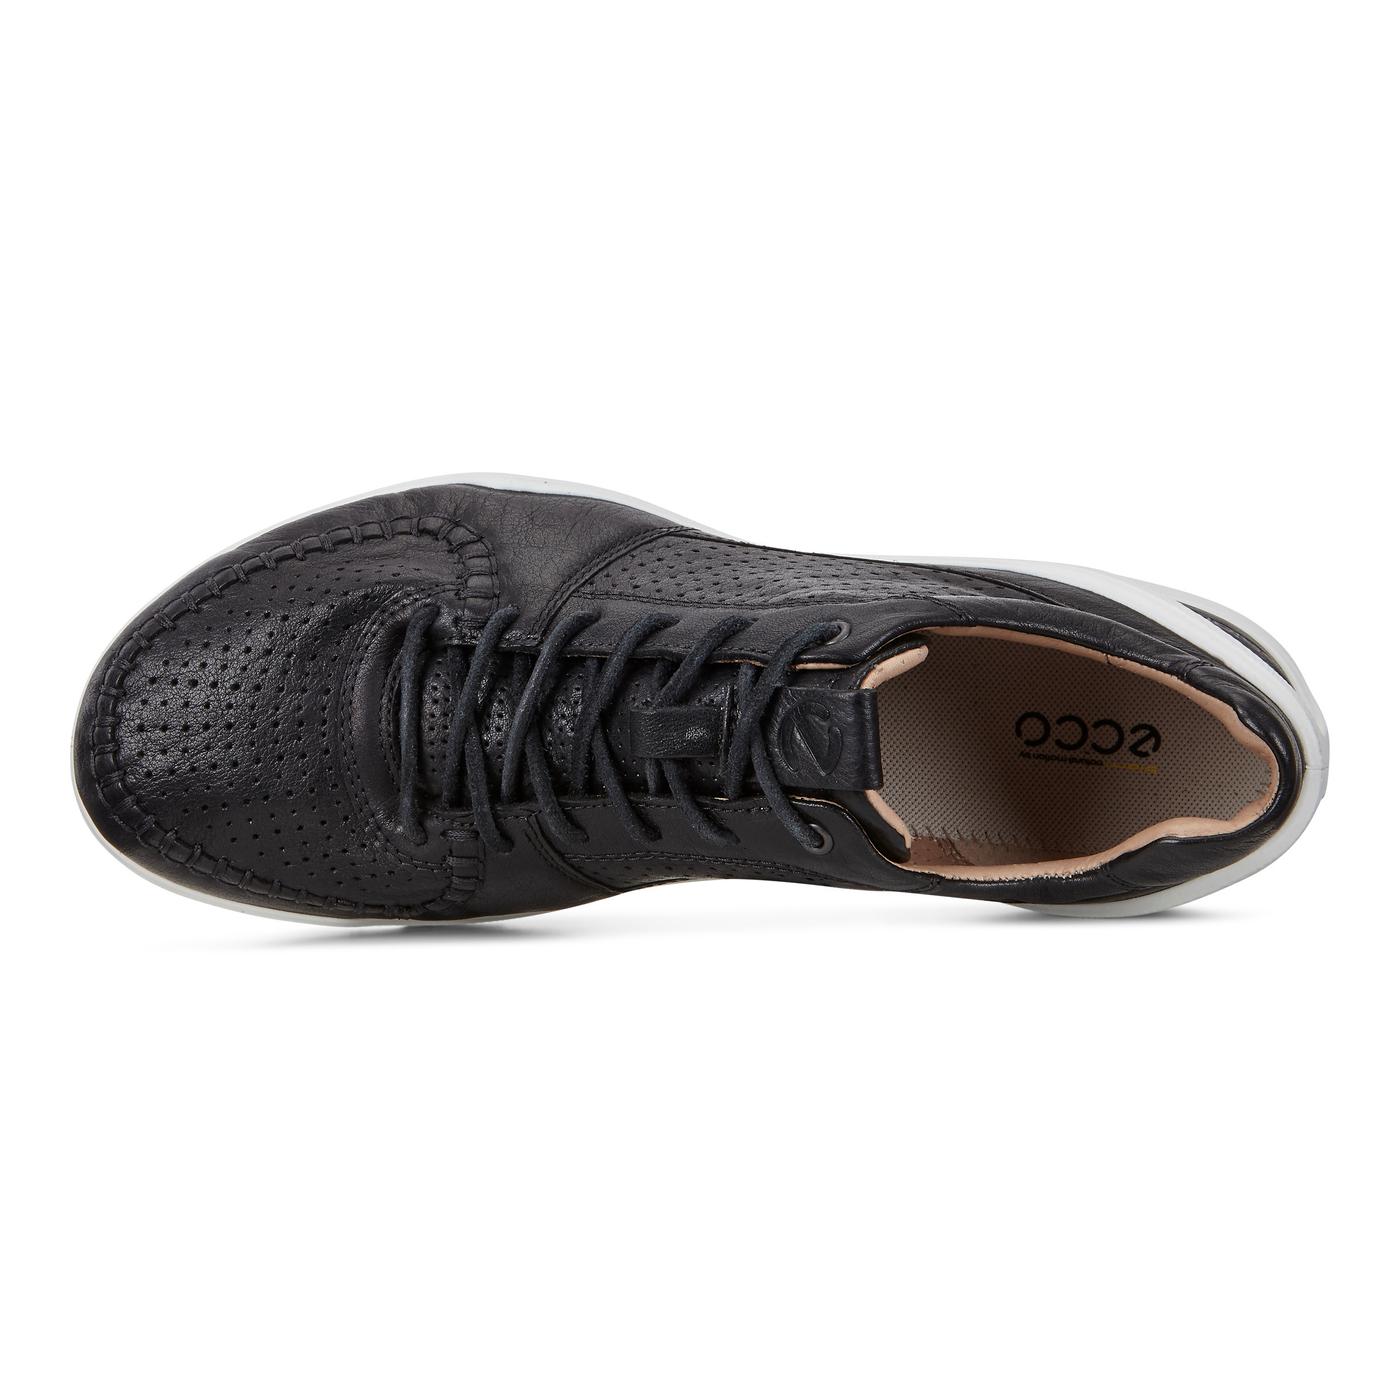 ECCO BIOM STREET Mens Roadmaster Sneaker